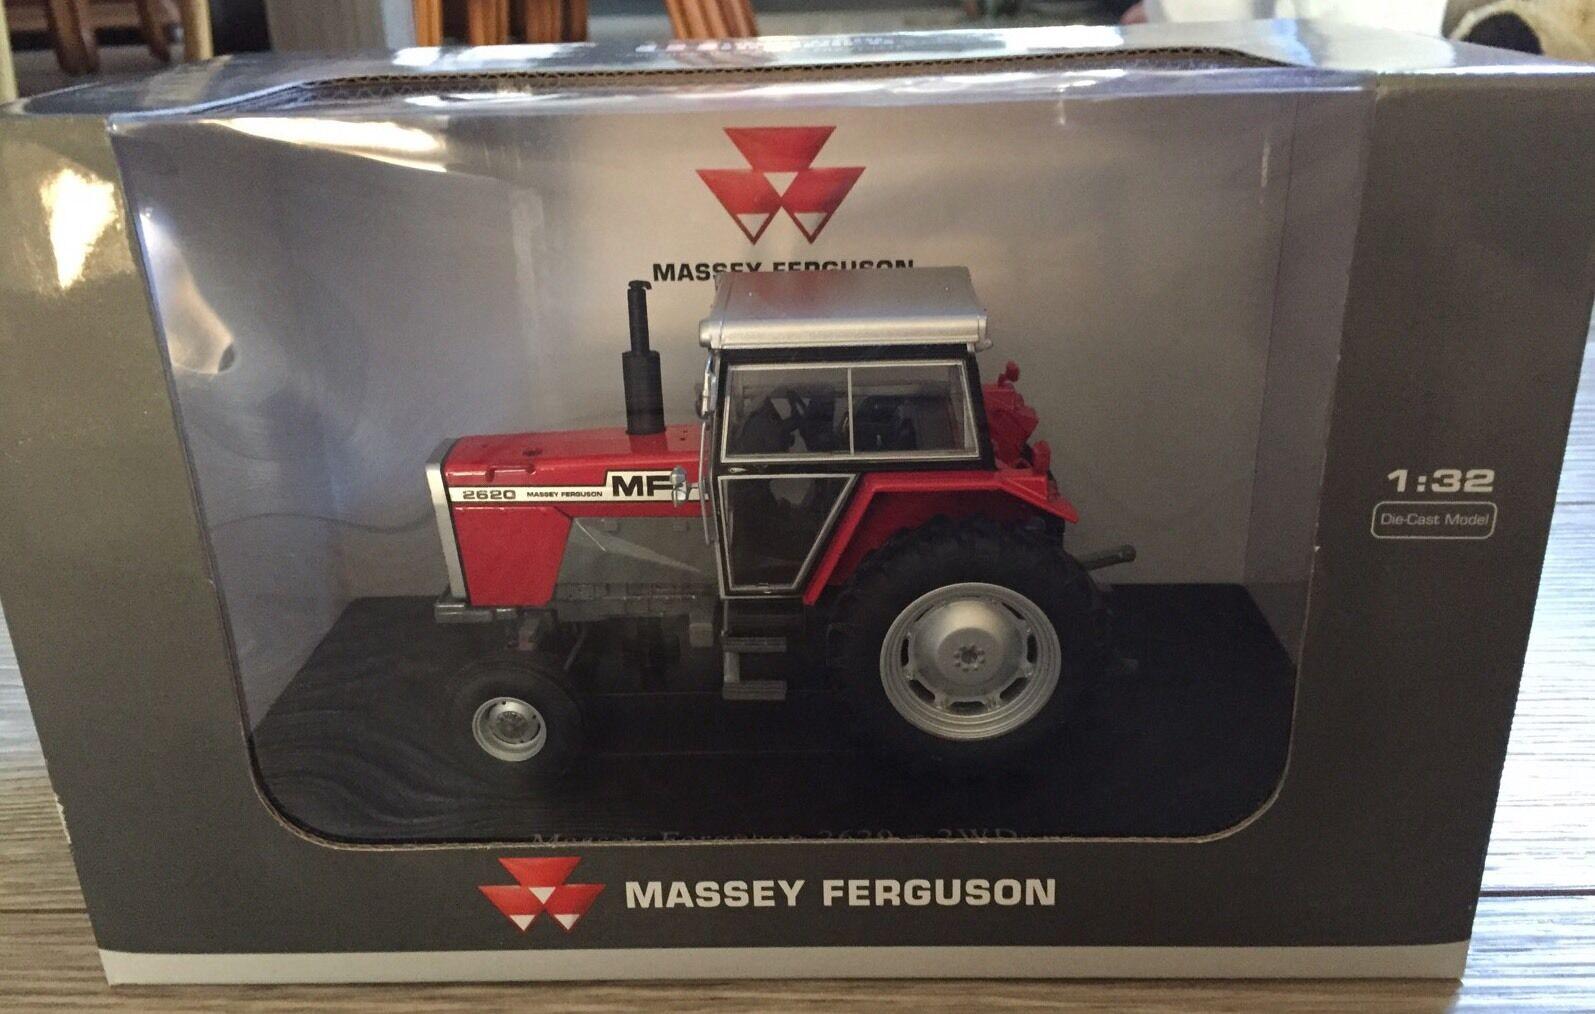 Massey ferguson tractor-mf2620 - 2wd - 1 32 th